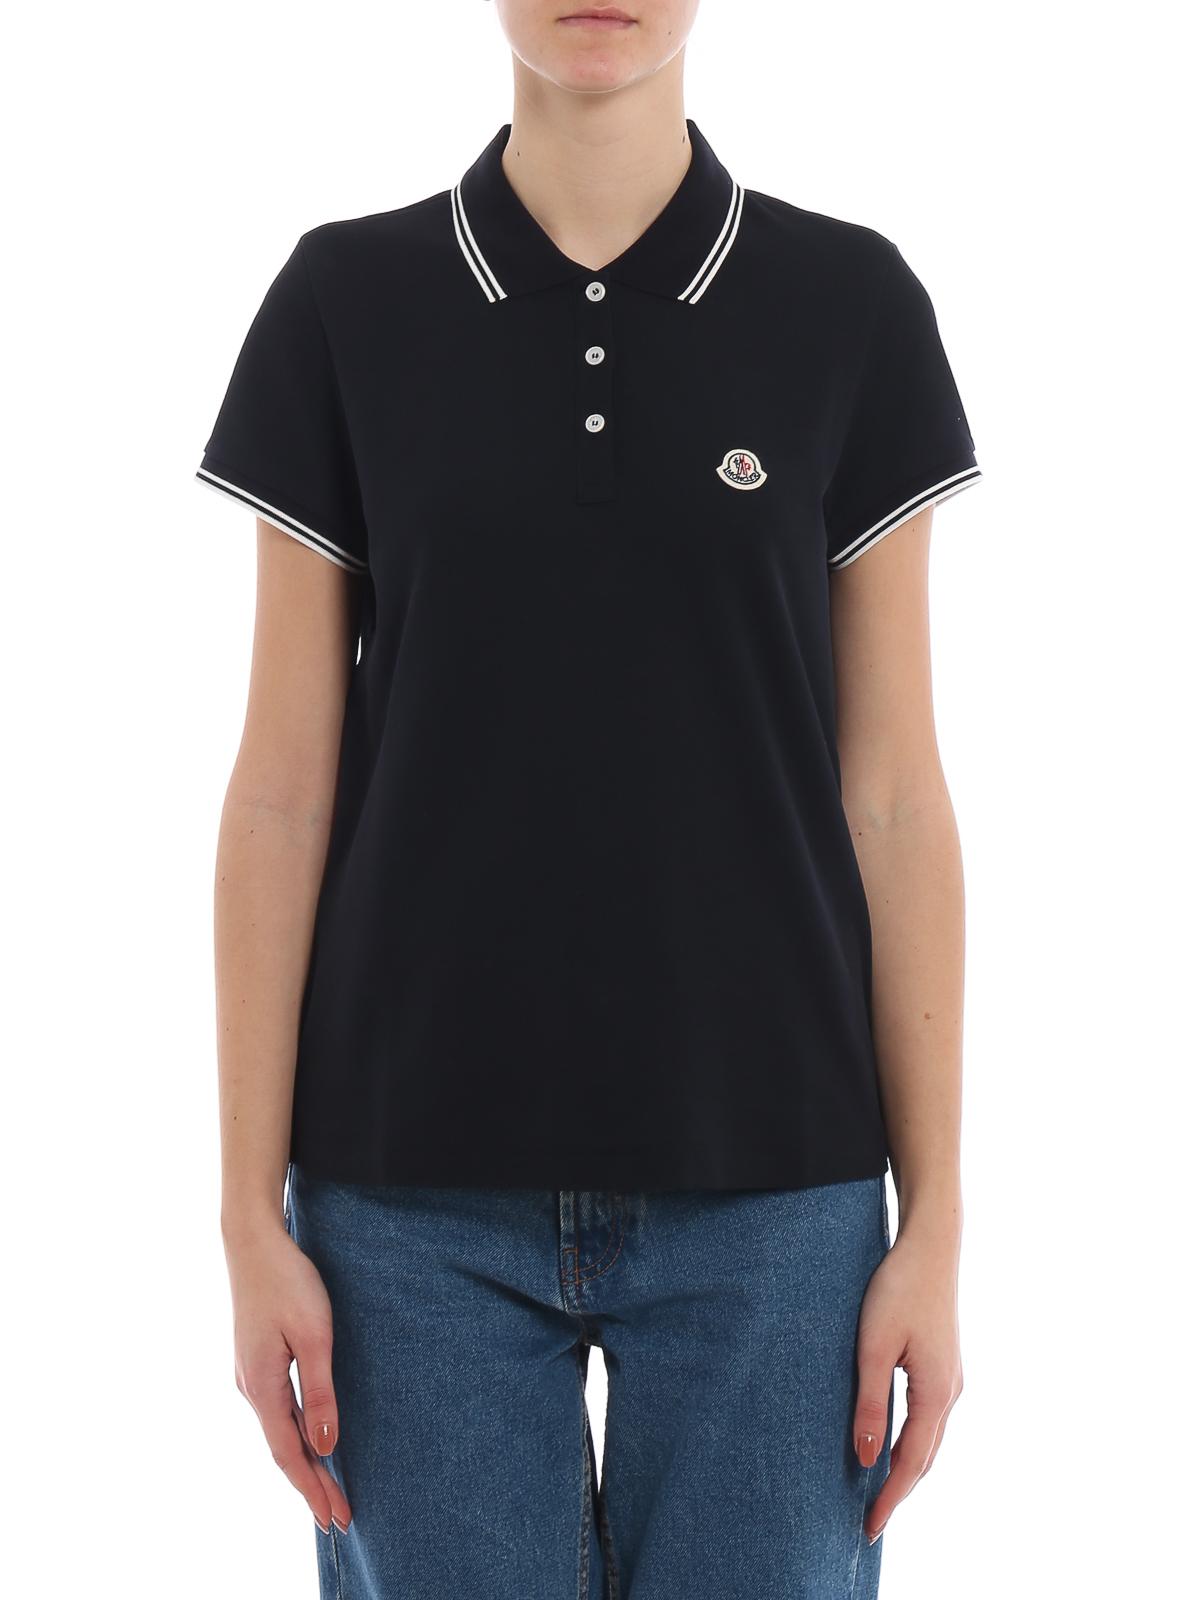 b0d73fdcafb8 Moncler - Two-tone detail polo shirt - polo shirts - 8386000 84667 778